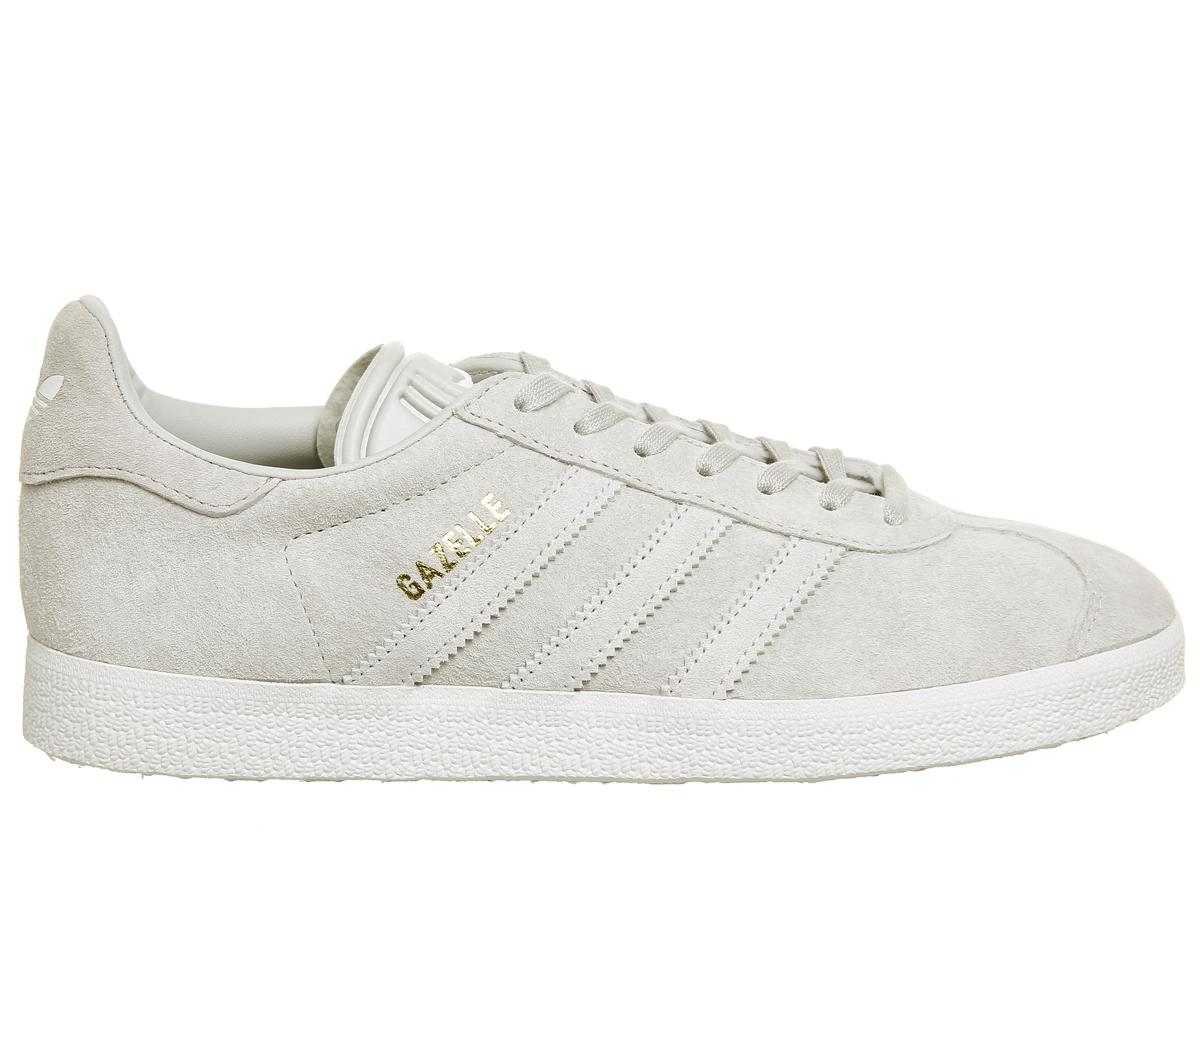 Damenschuhe Adidas Gazelle Trainers GREY TWO ONE Weiß GREY TWO GREY F Trainers Schuhes 84af41